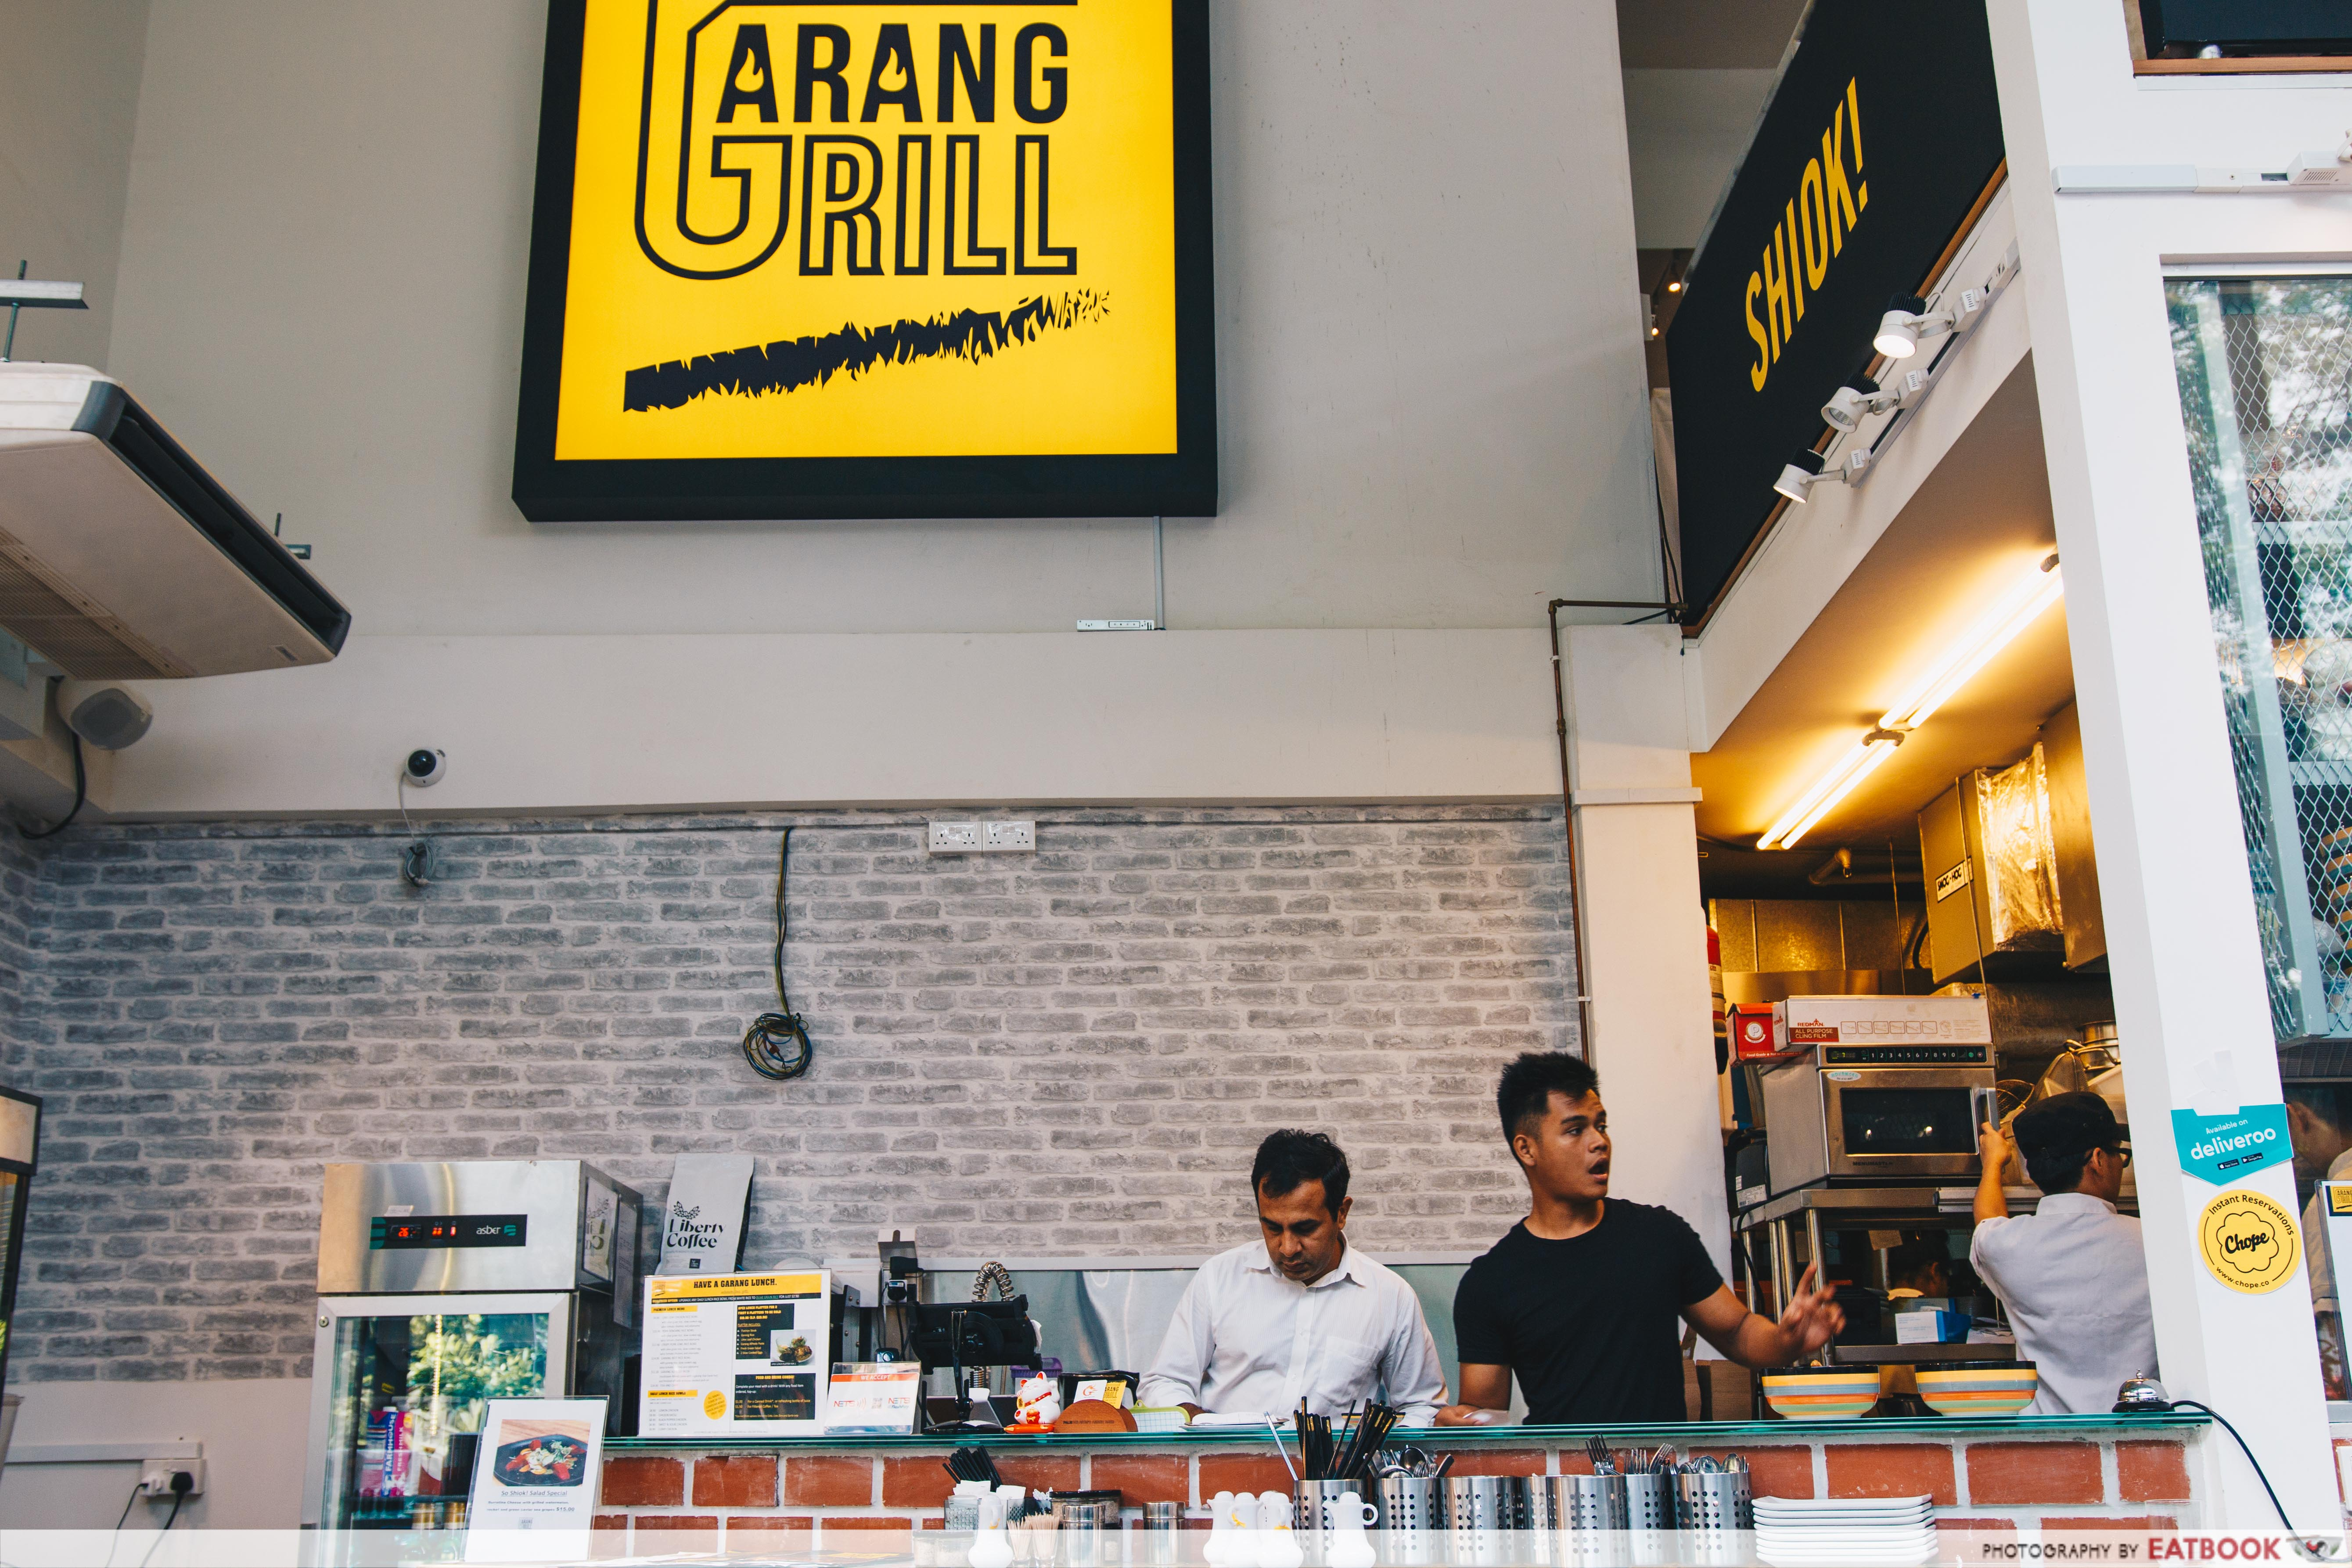 Garang Grill - storefront